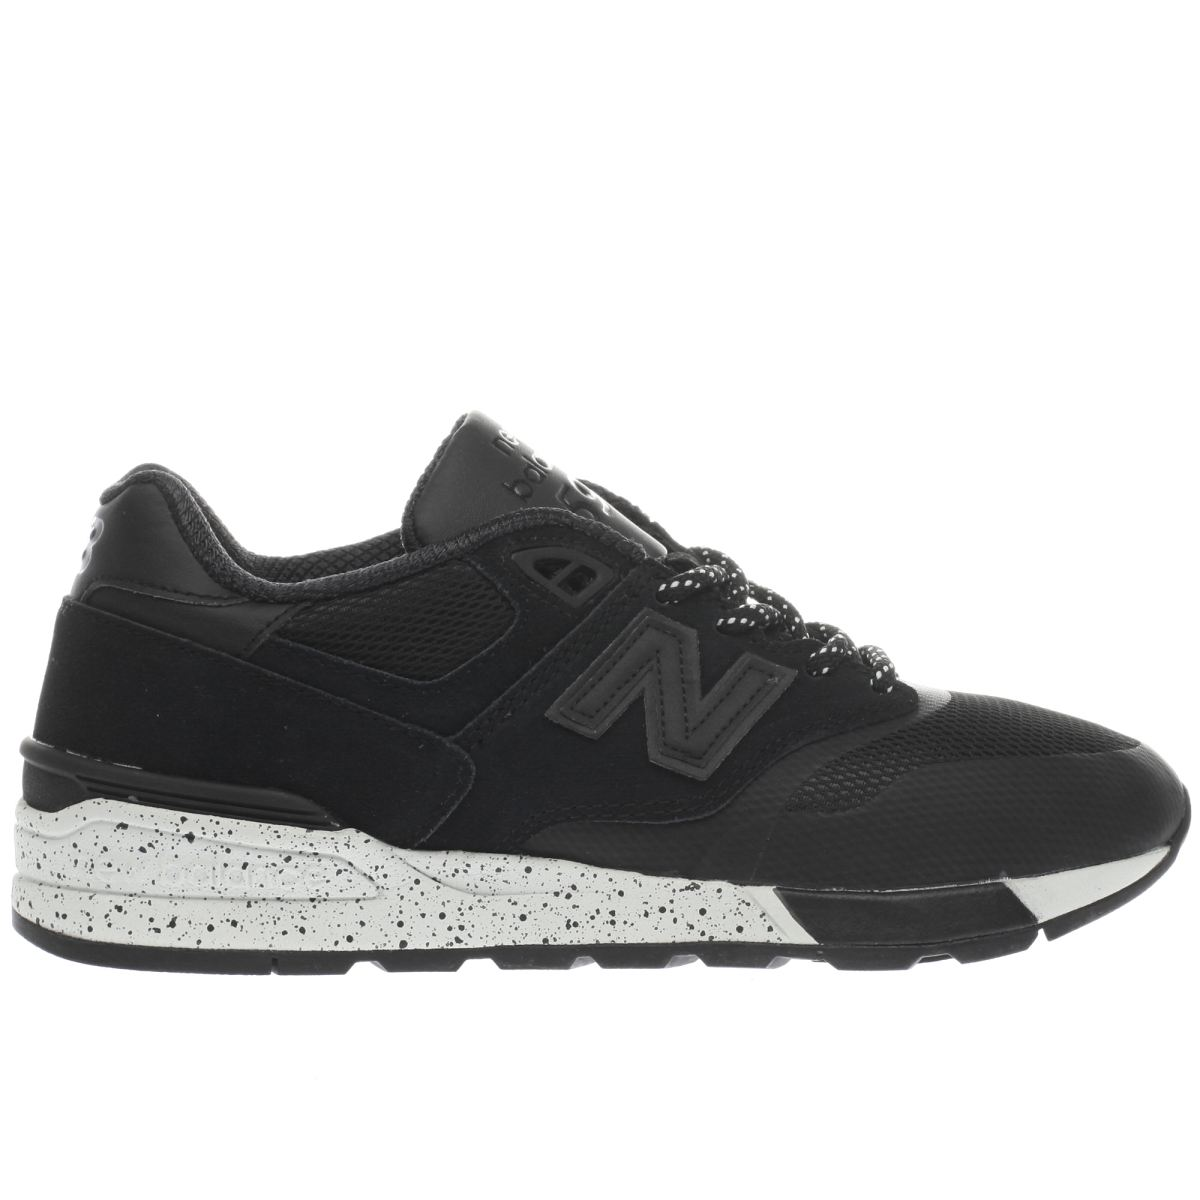 new balance black 597 trainers